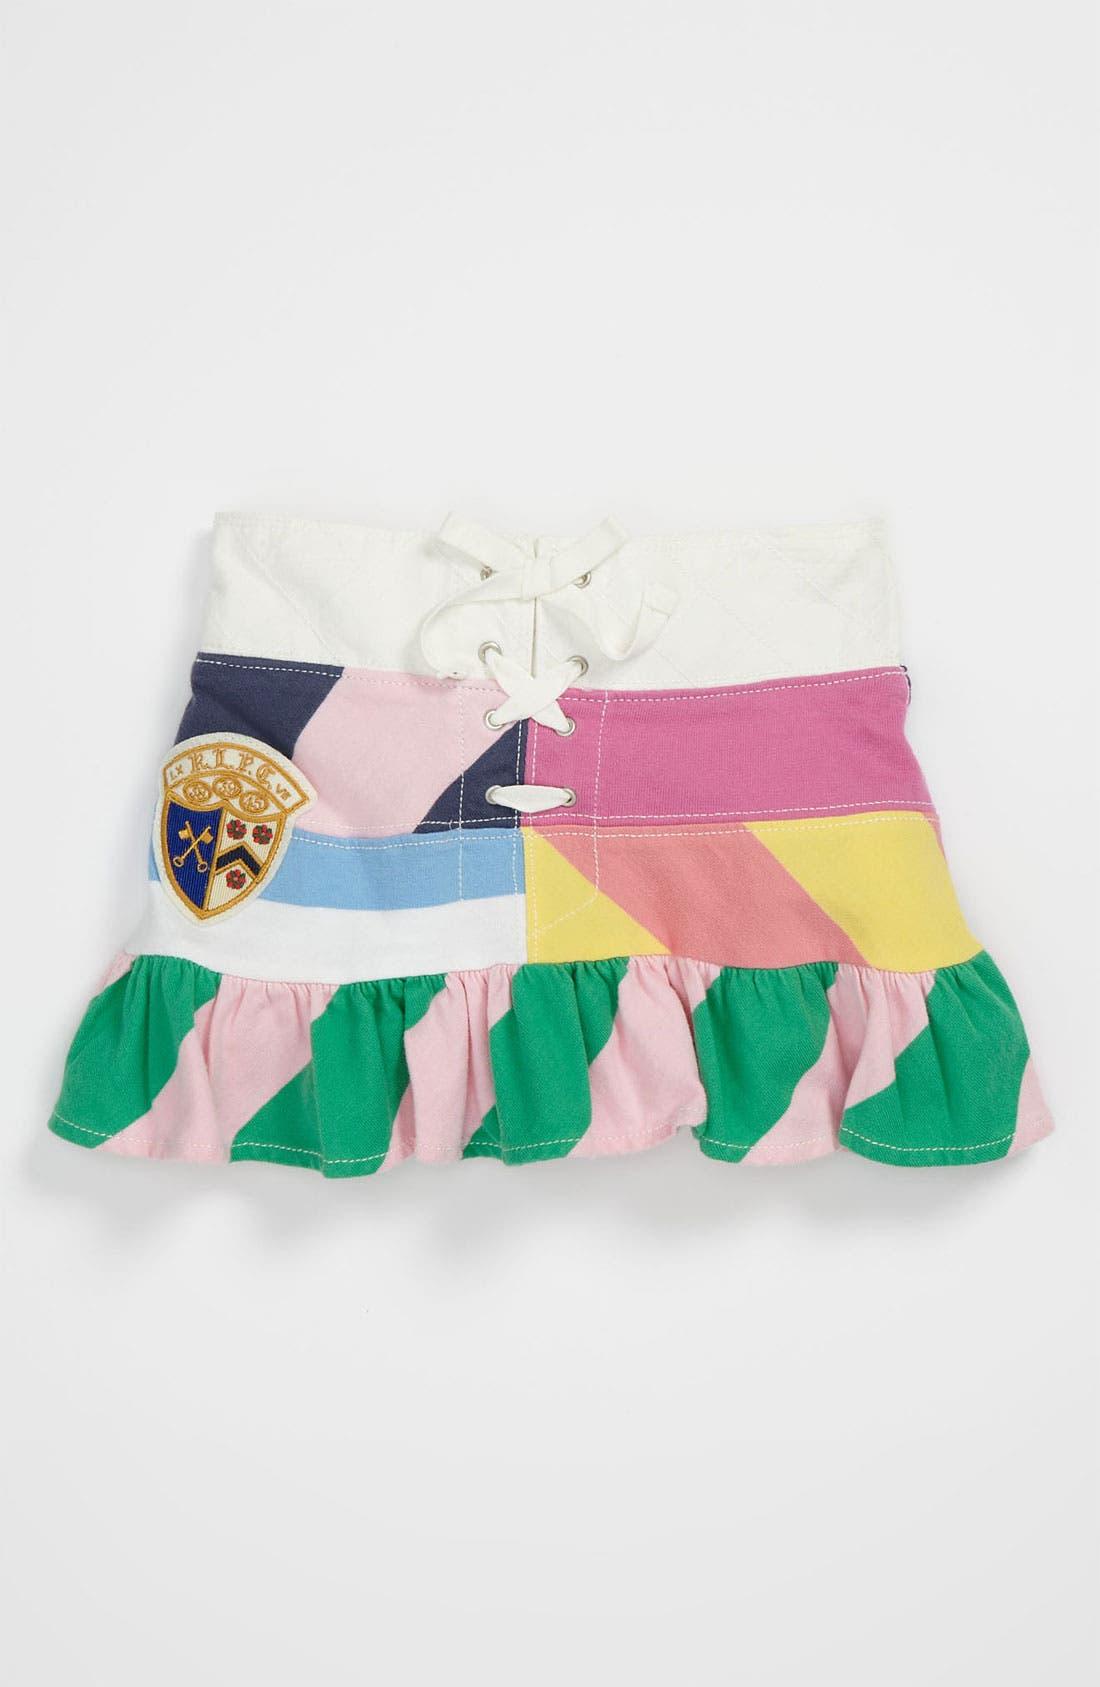 Alternate Image 1 Selected - Ralph Lauren Patchwork Skirt (Toddler)